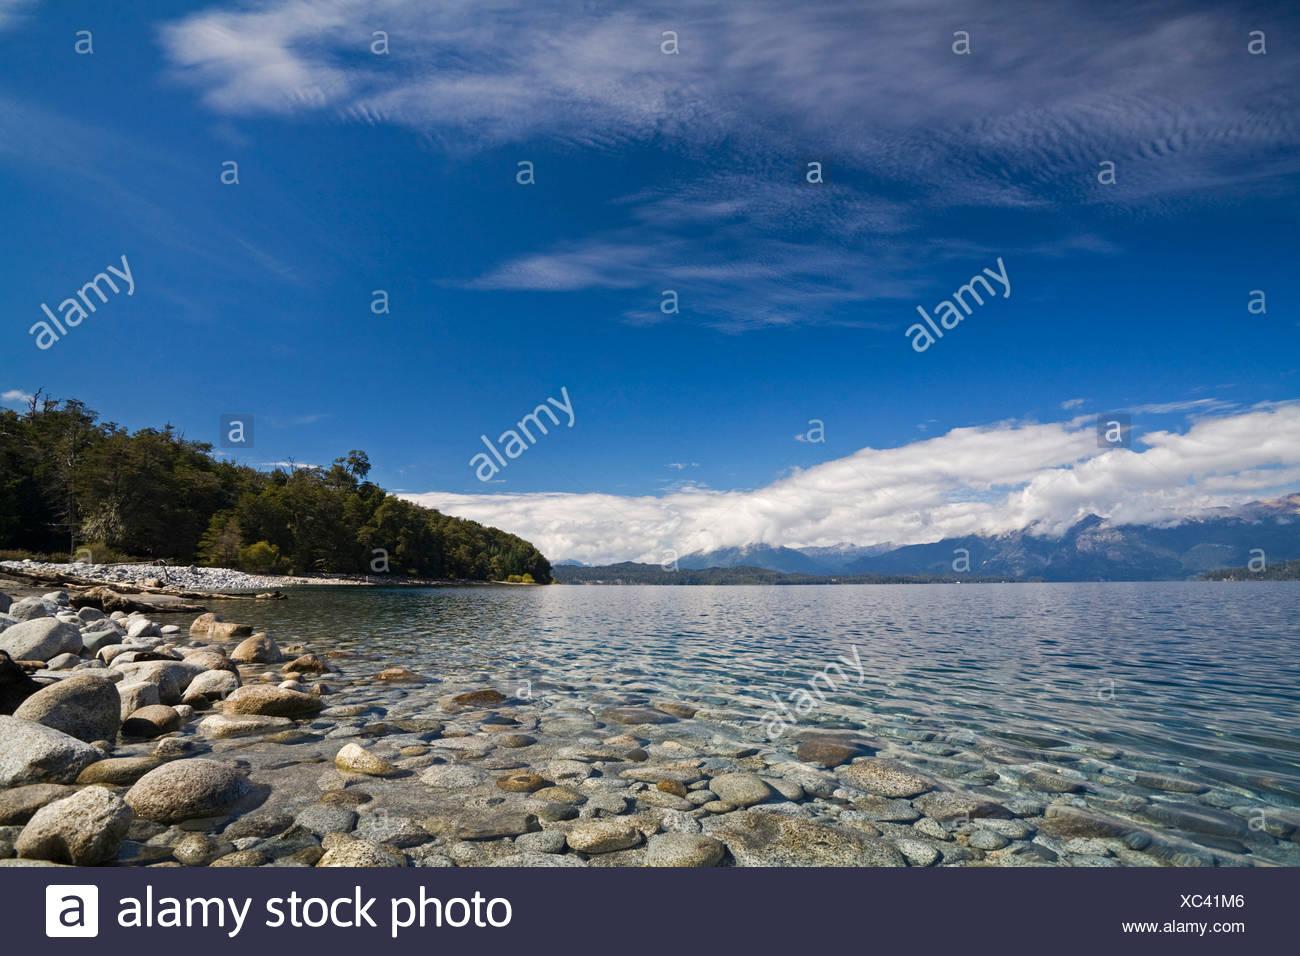 Lake Nahuel Huapi, national park Parque Nacional Nahuel Huapi, lake region of northern Patagonia, Argentina, South America Stock Photo